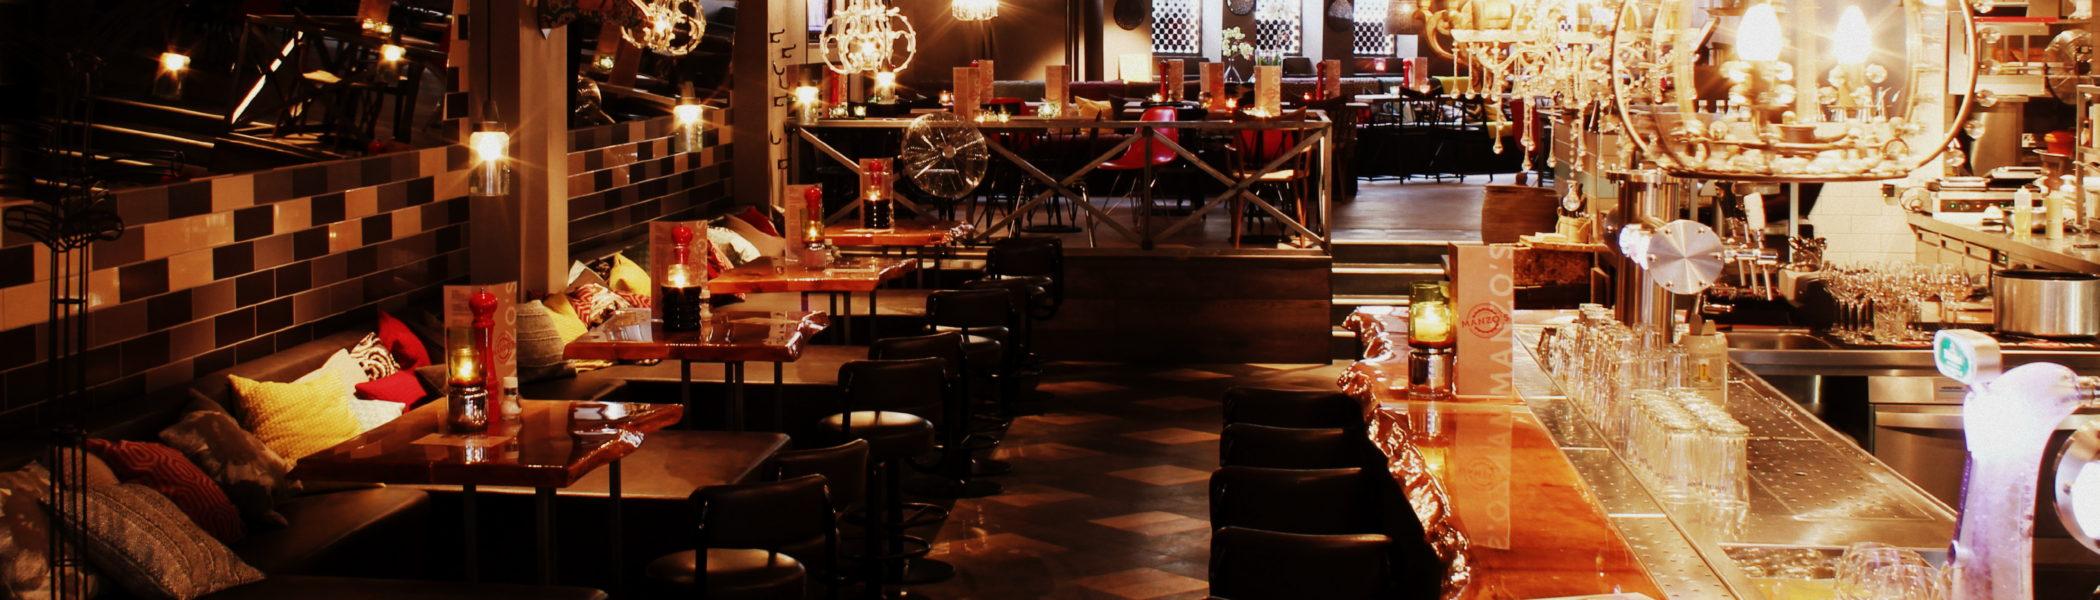 restaurant-zaandam-manzo-bar-bistro-interieur-bar-entresol